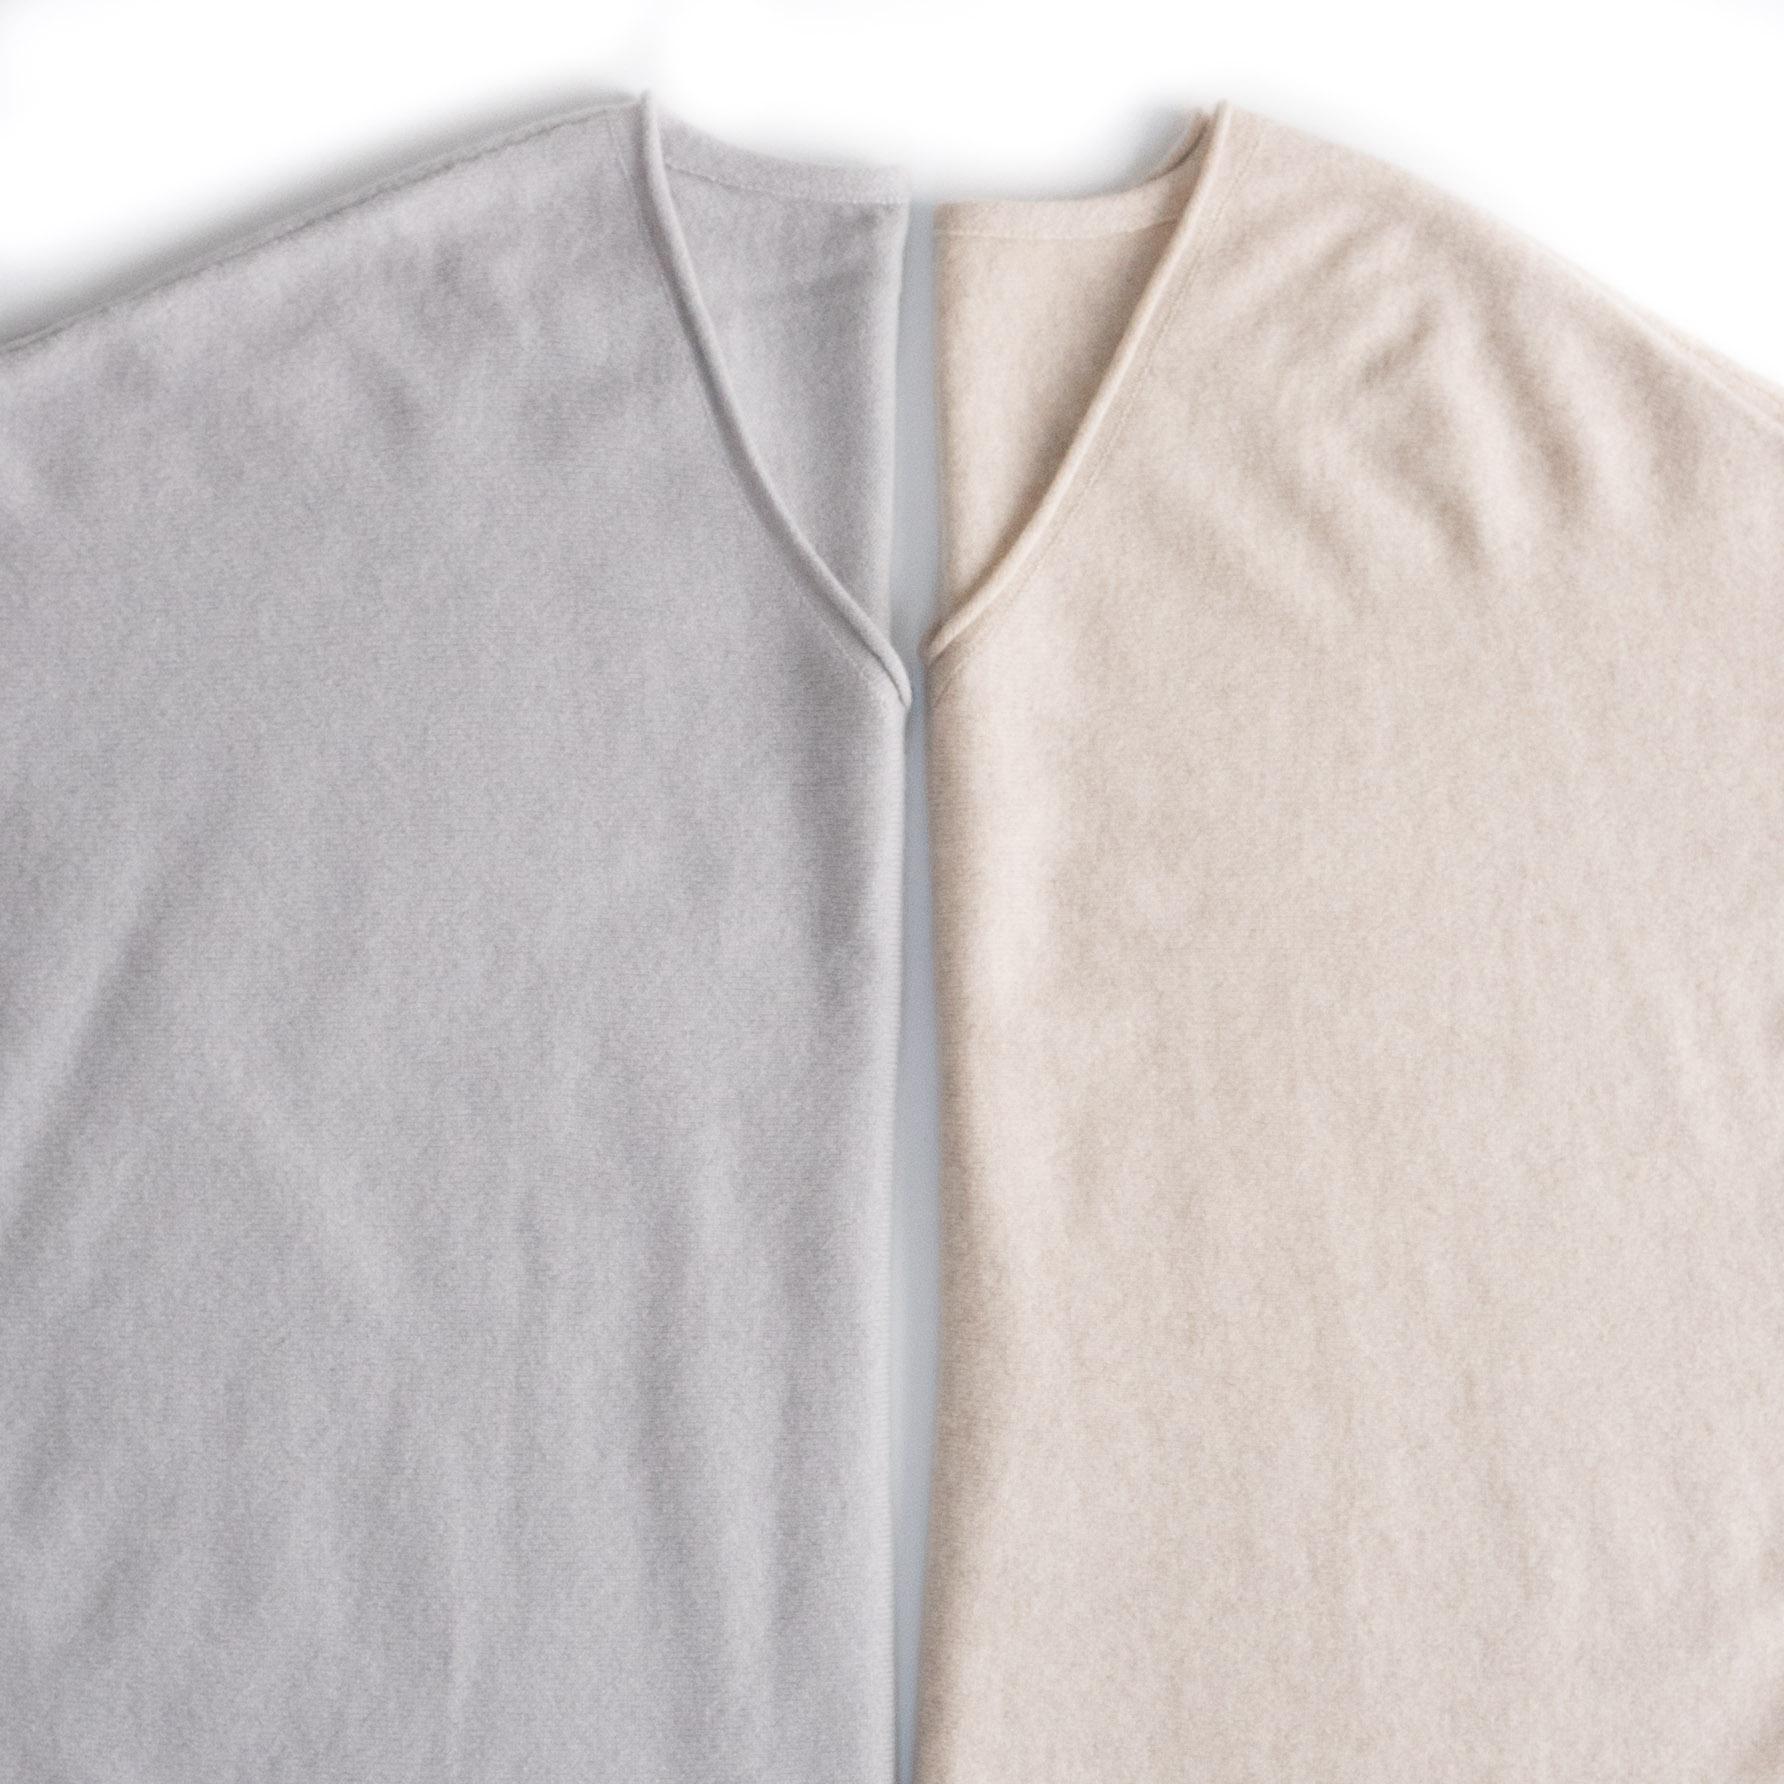 henry christ v-neck cashmere jumpers gqotsqb